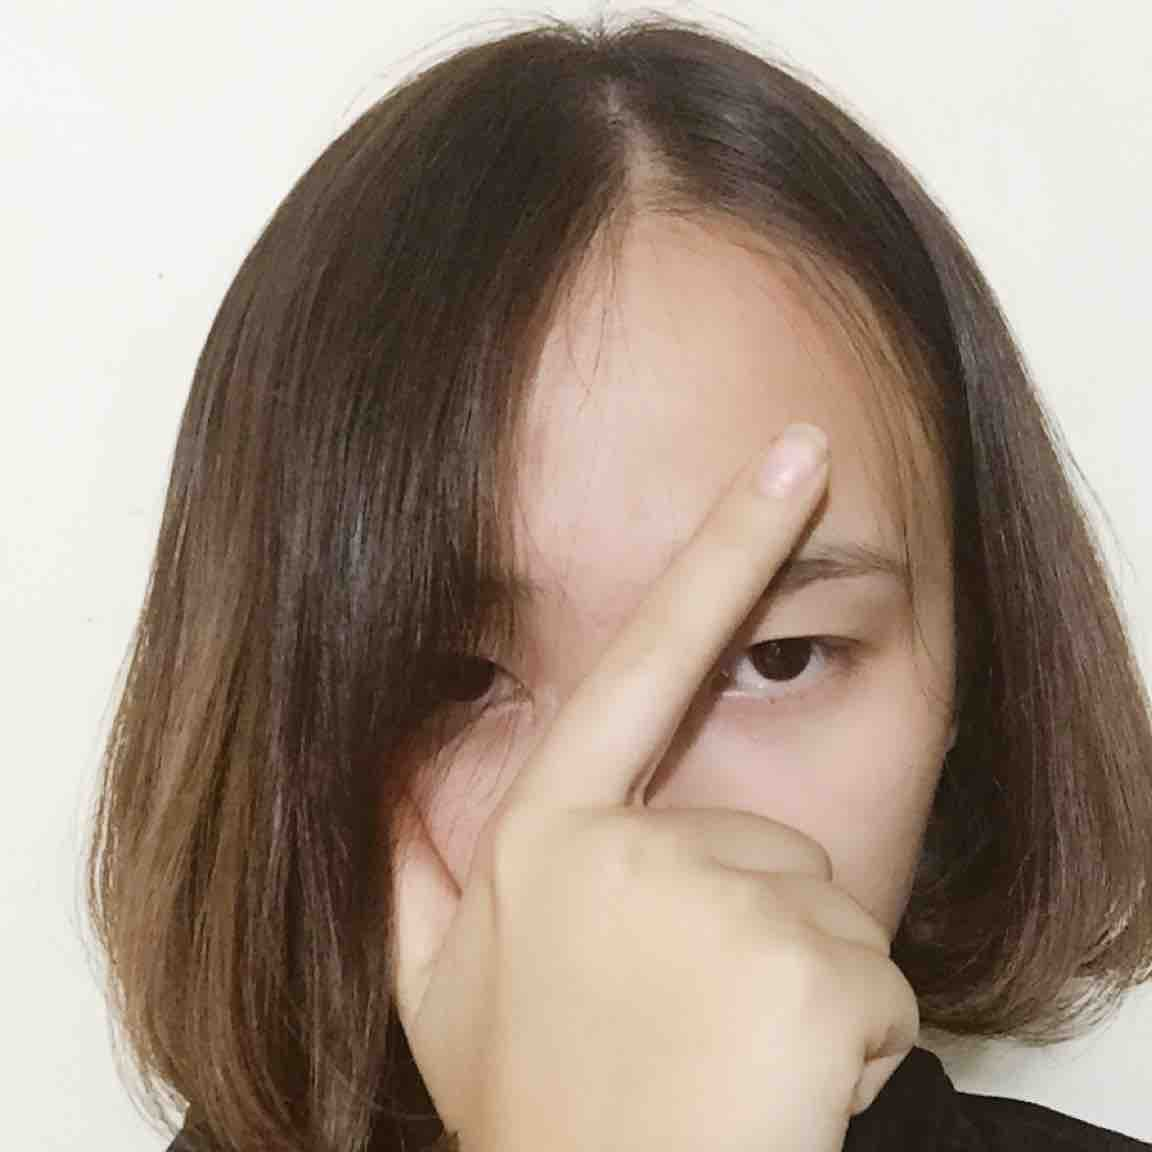 Bui Tran Thao My